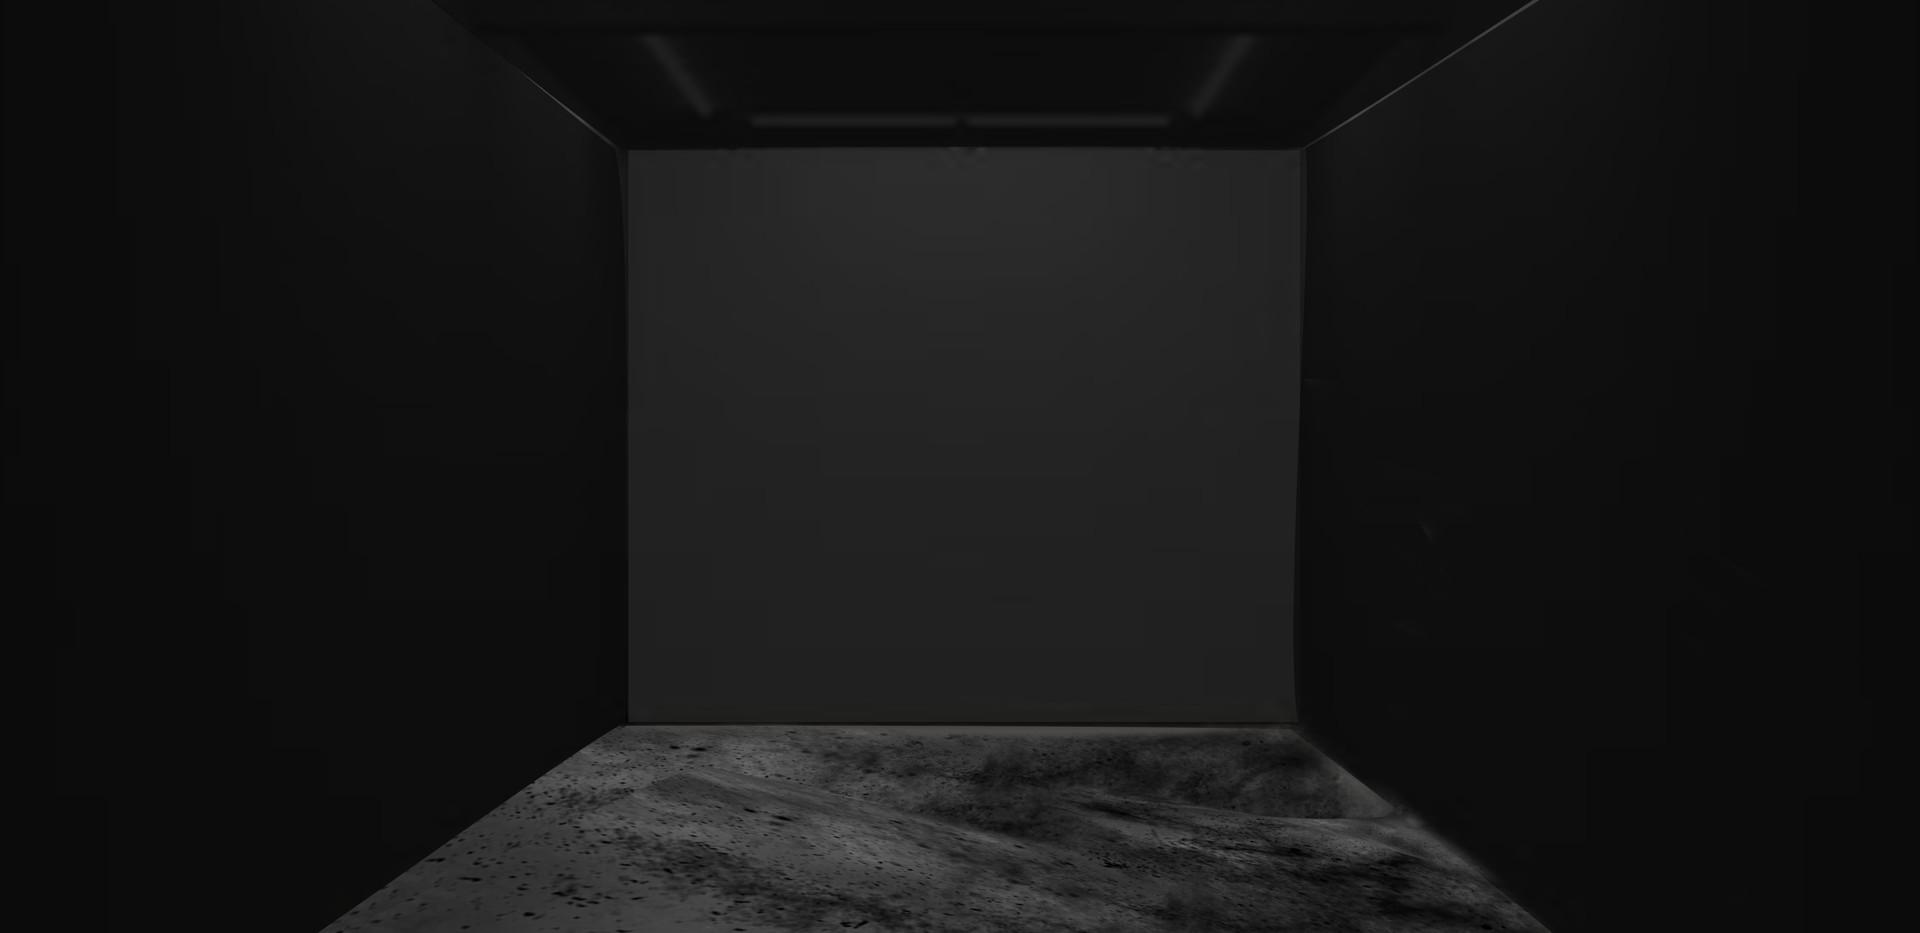 No Accent installation sketch